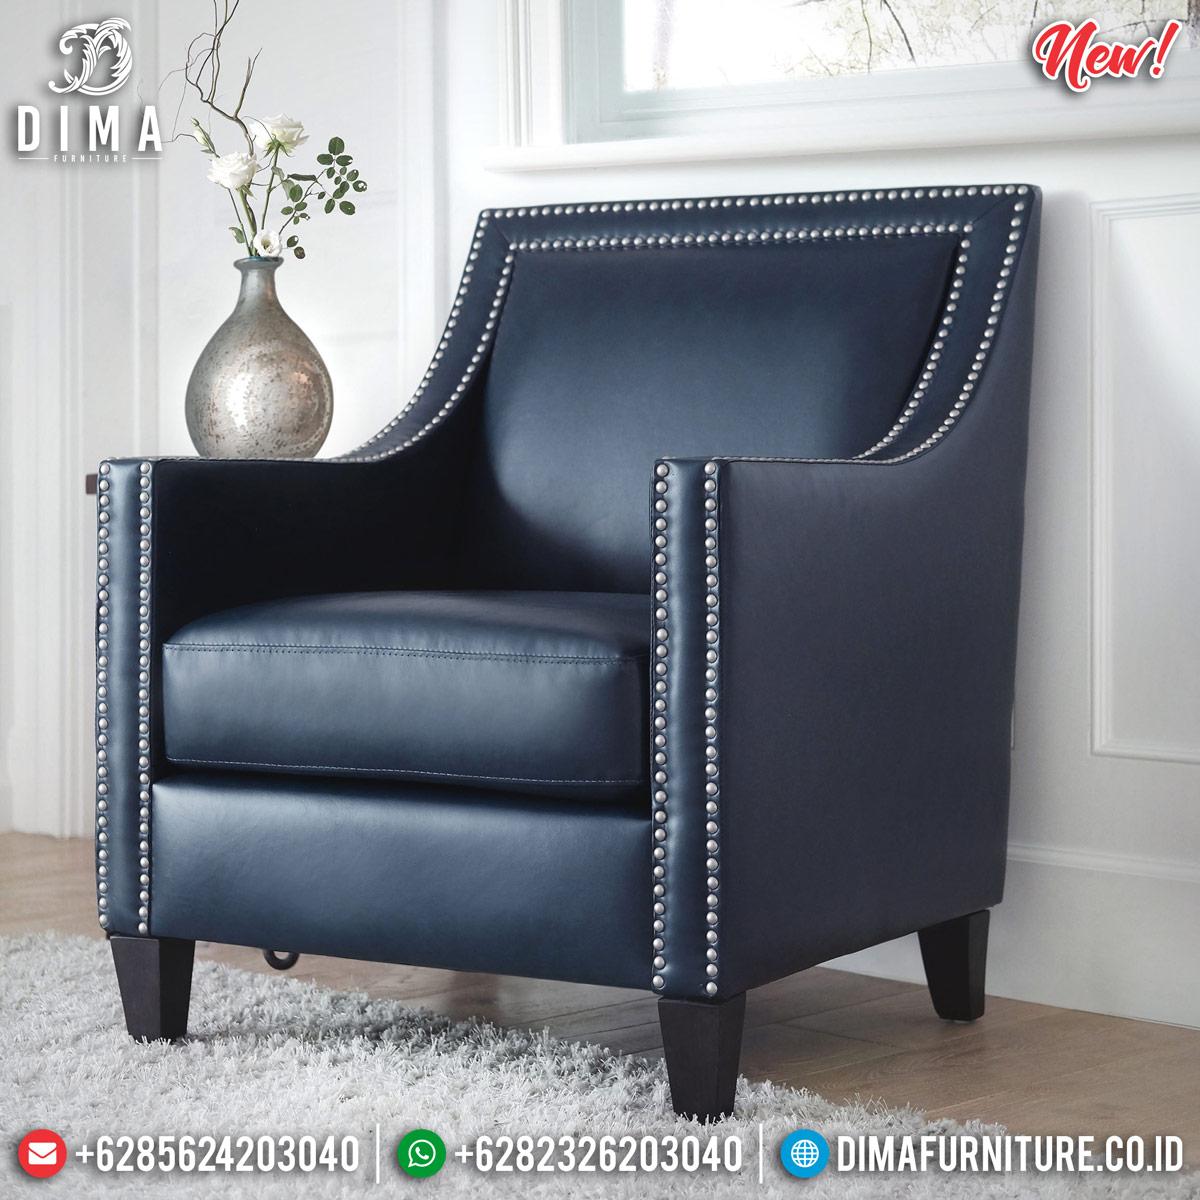 Inspiring Design Sofa Minimalis Jepara New Style Minimalist Modern TTJ-0899 Model 1